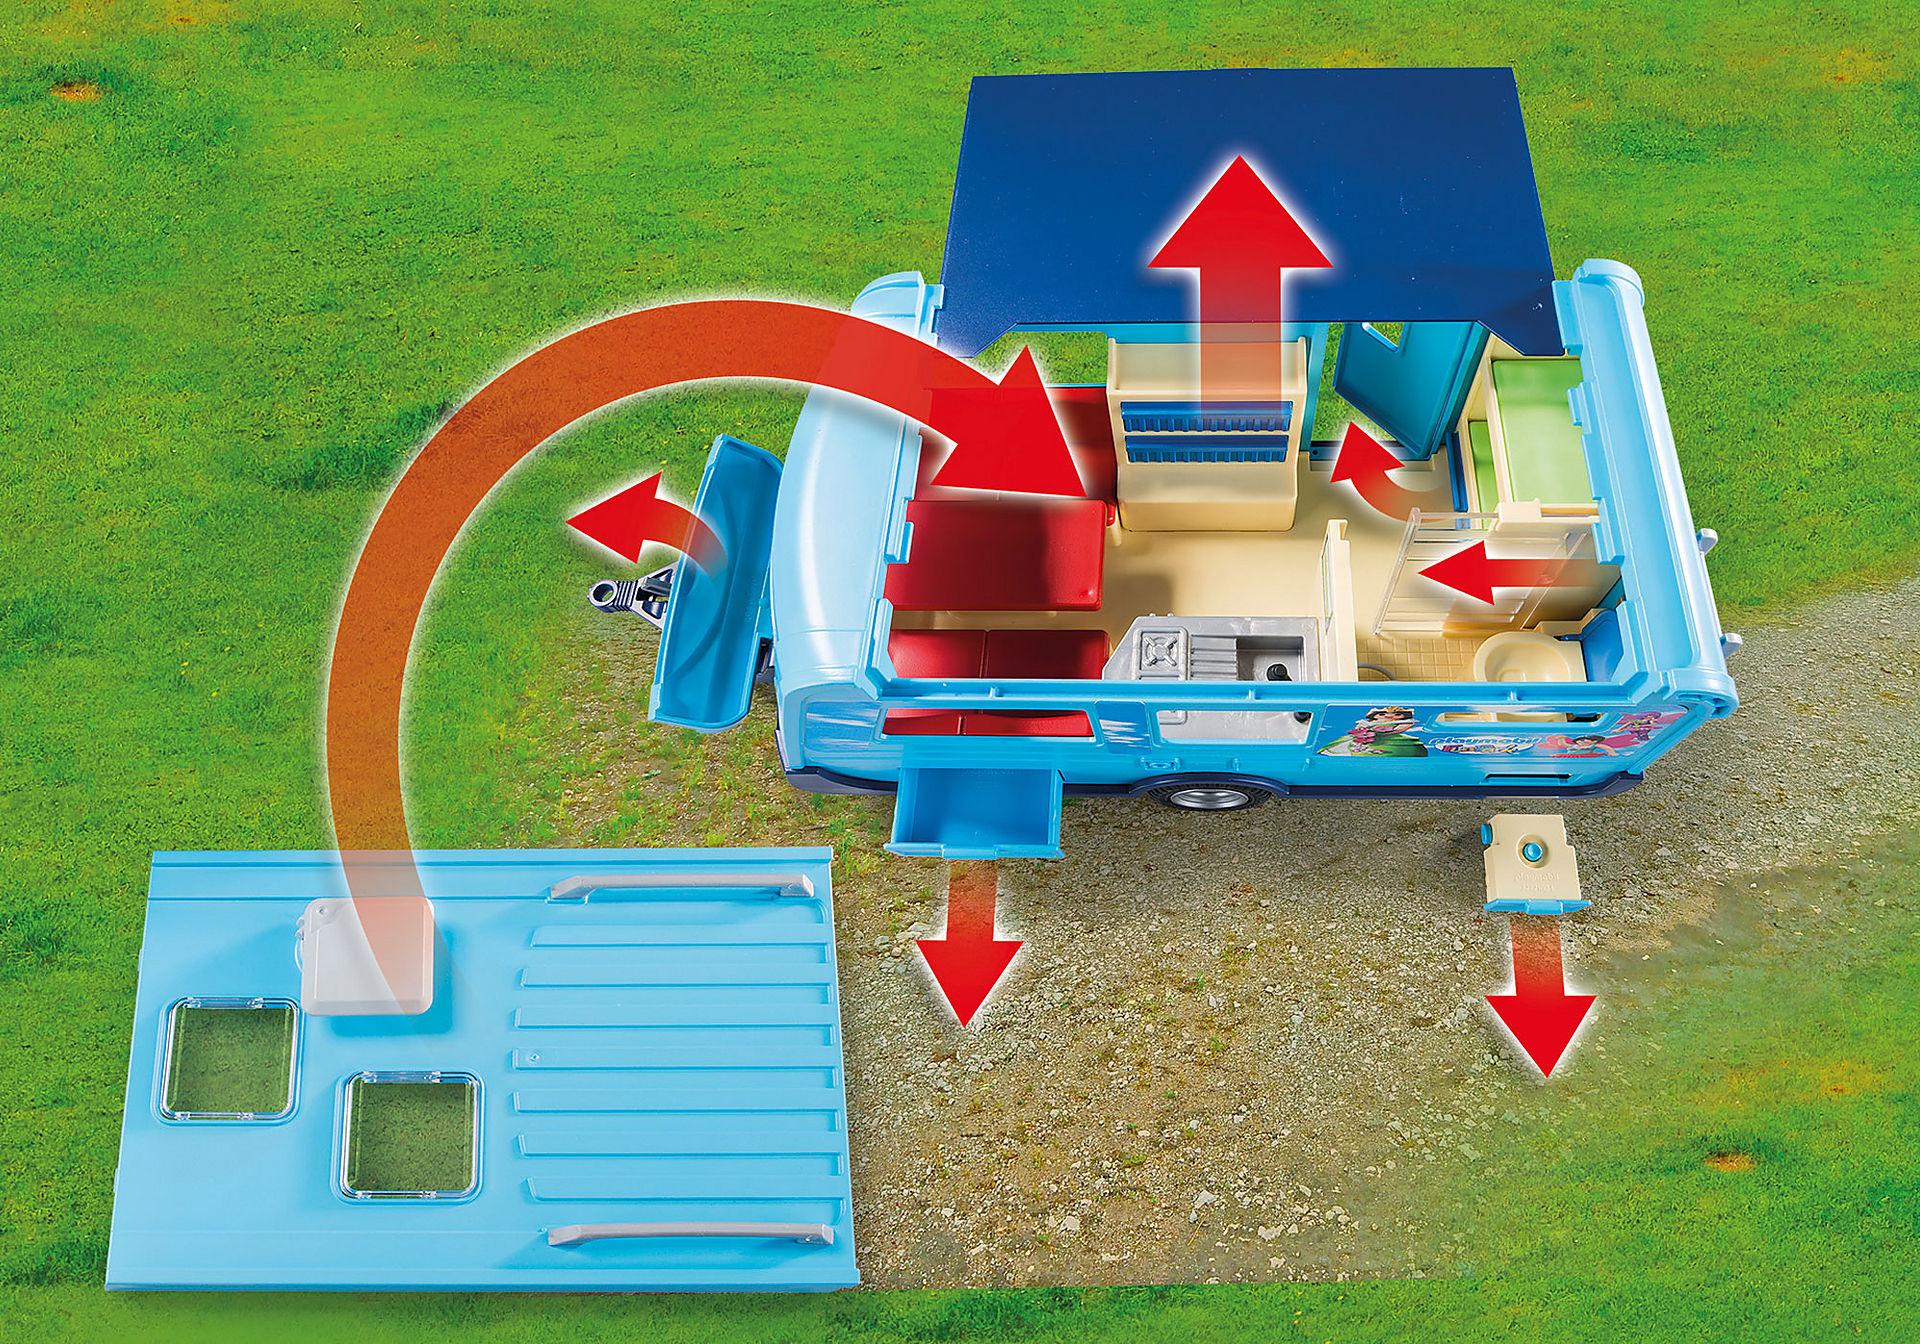 http://media.playmobil.com/i/playmobil/9502_product_extra2/Playmobil-Pick-Up mit Wohnwagen